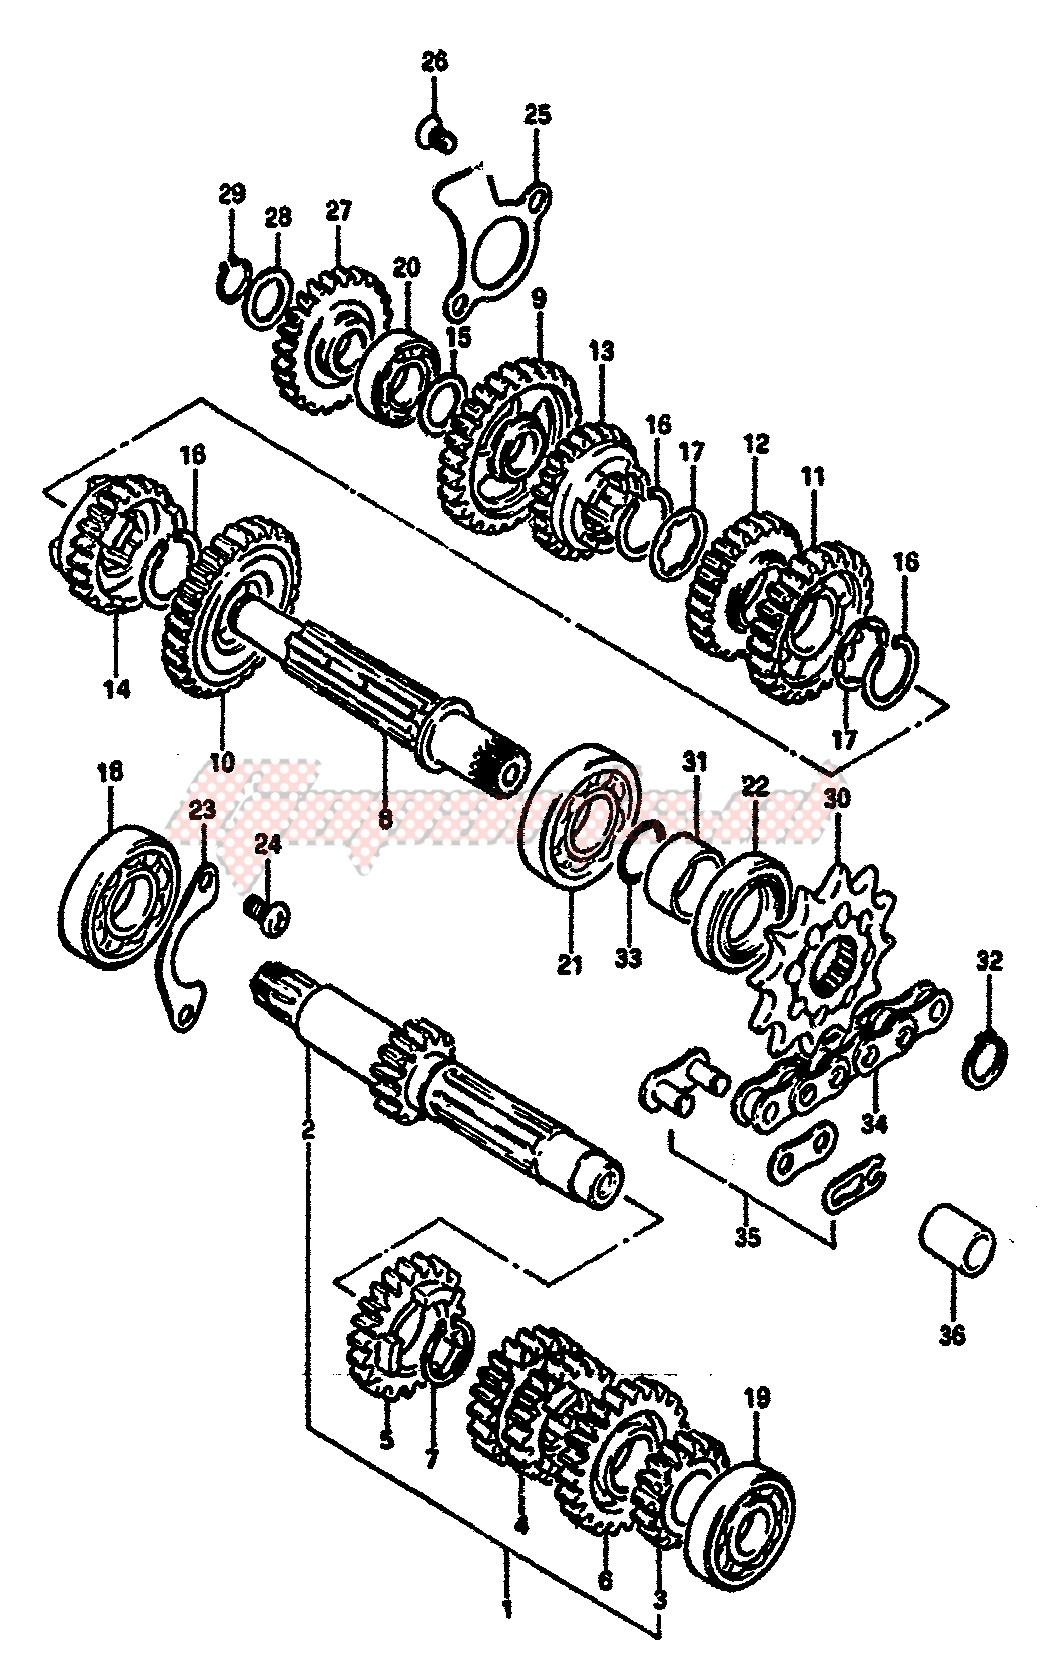 TRANSMISSION (MODEL E) image